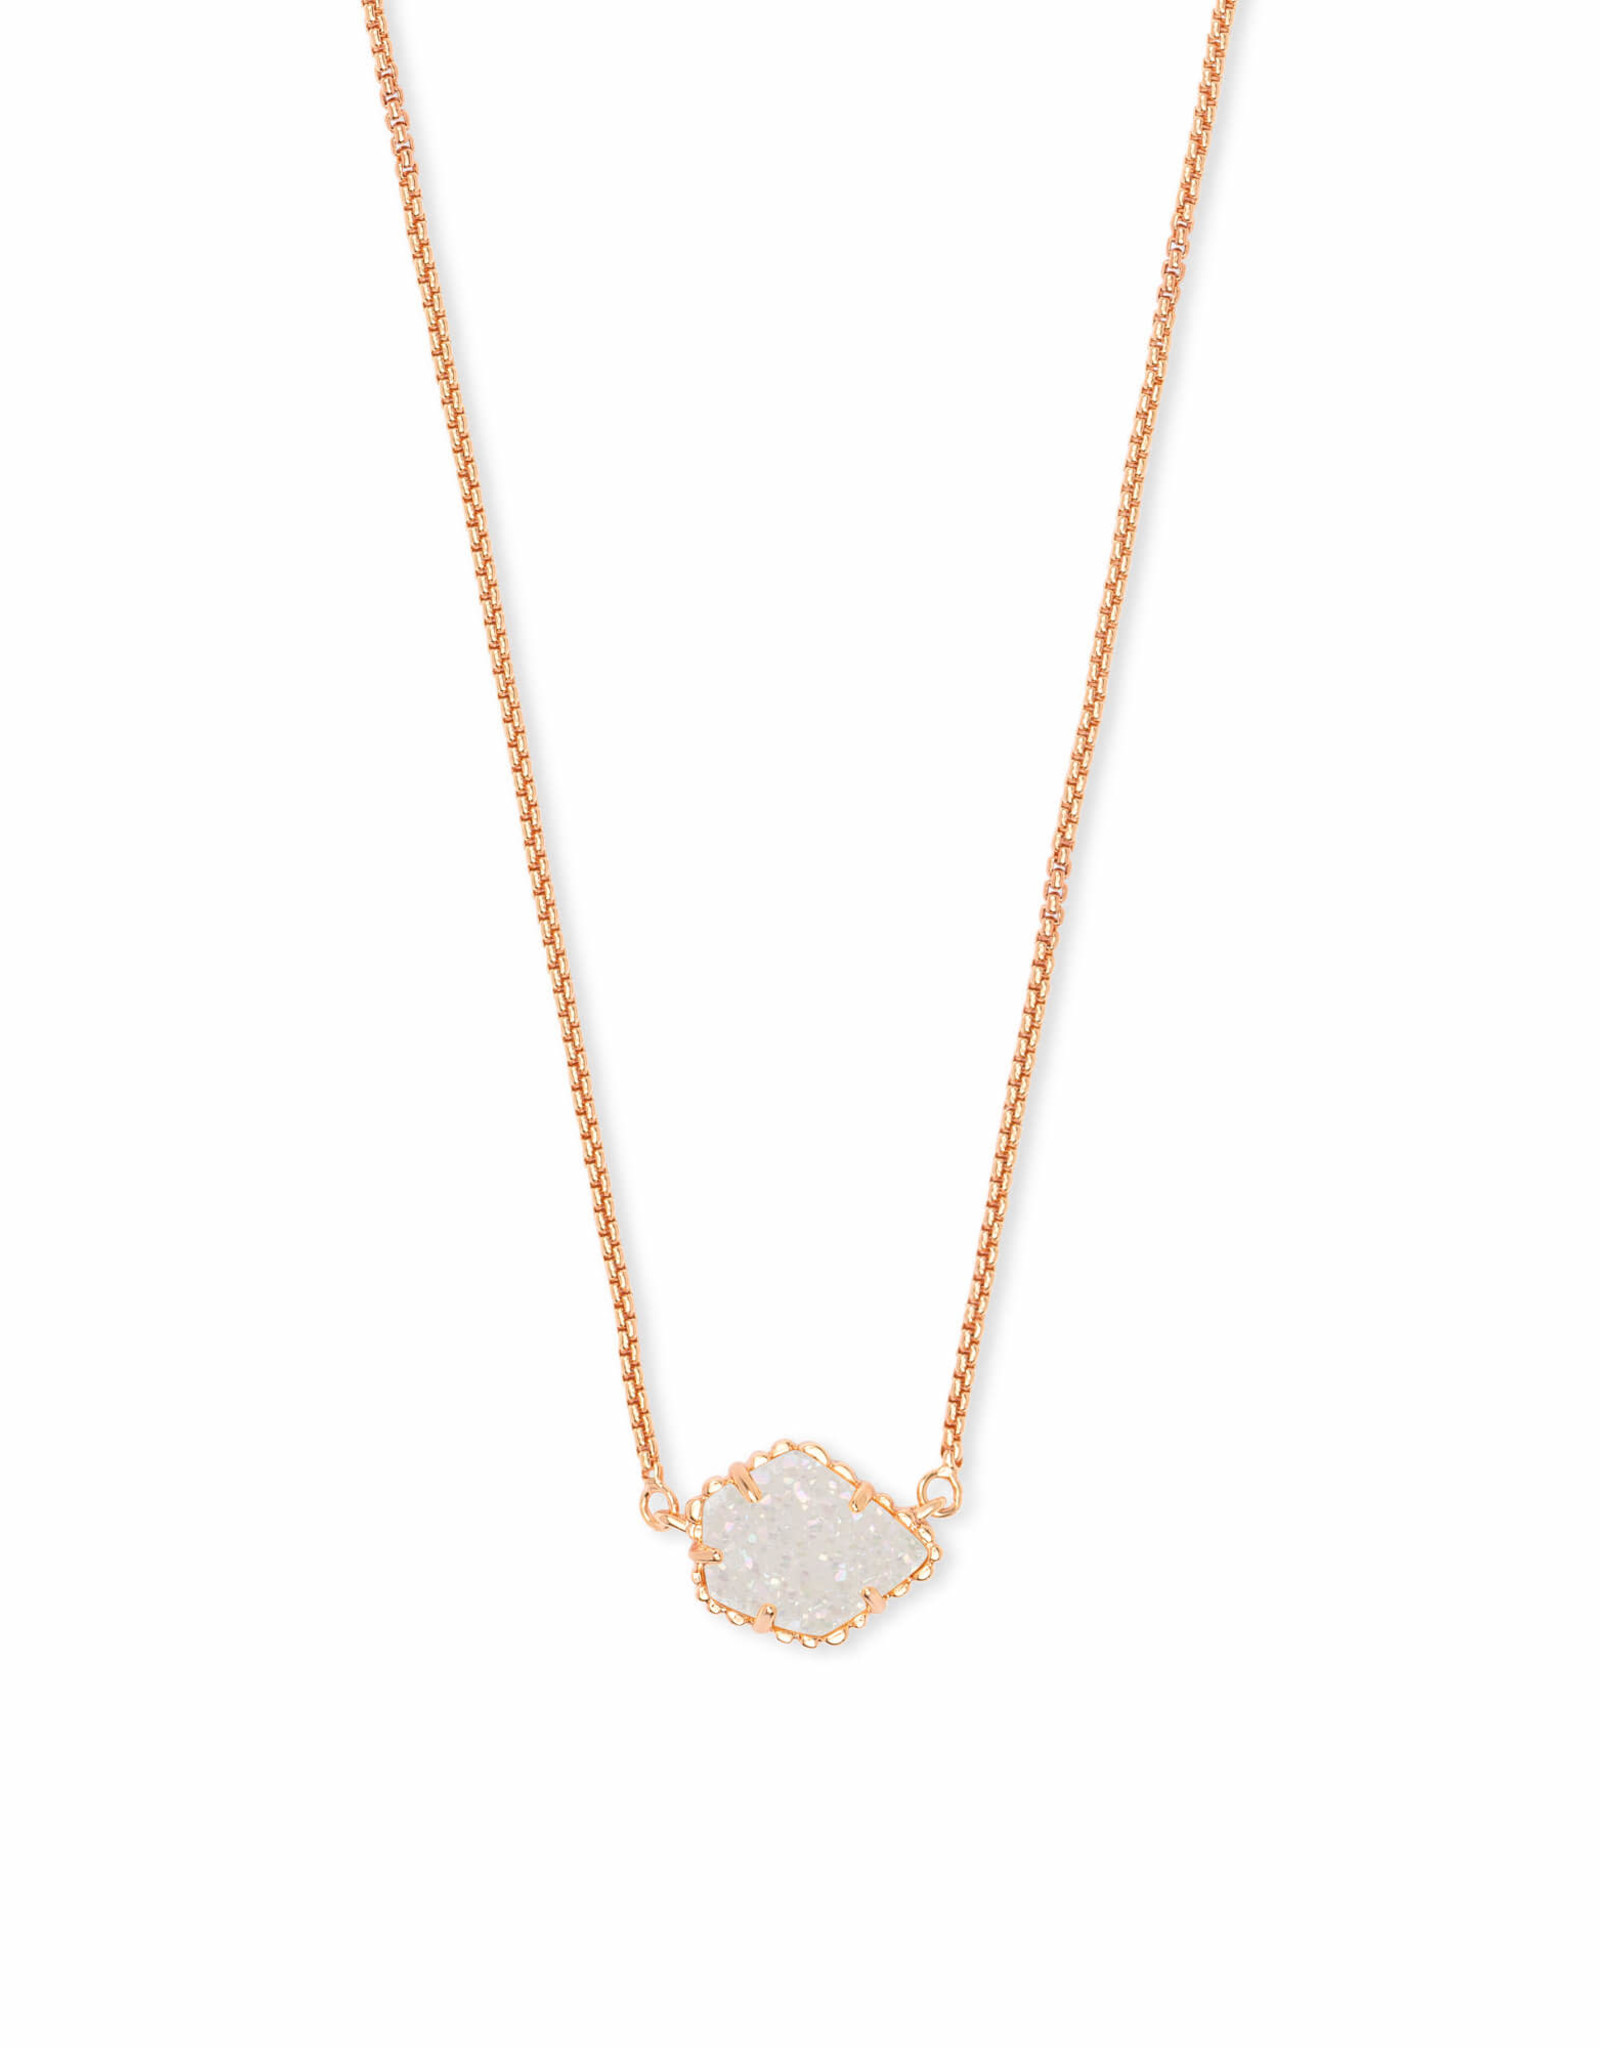 Kendra Scott Tess Necklace - Iridescent Drusy/Rose Gold